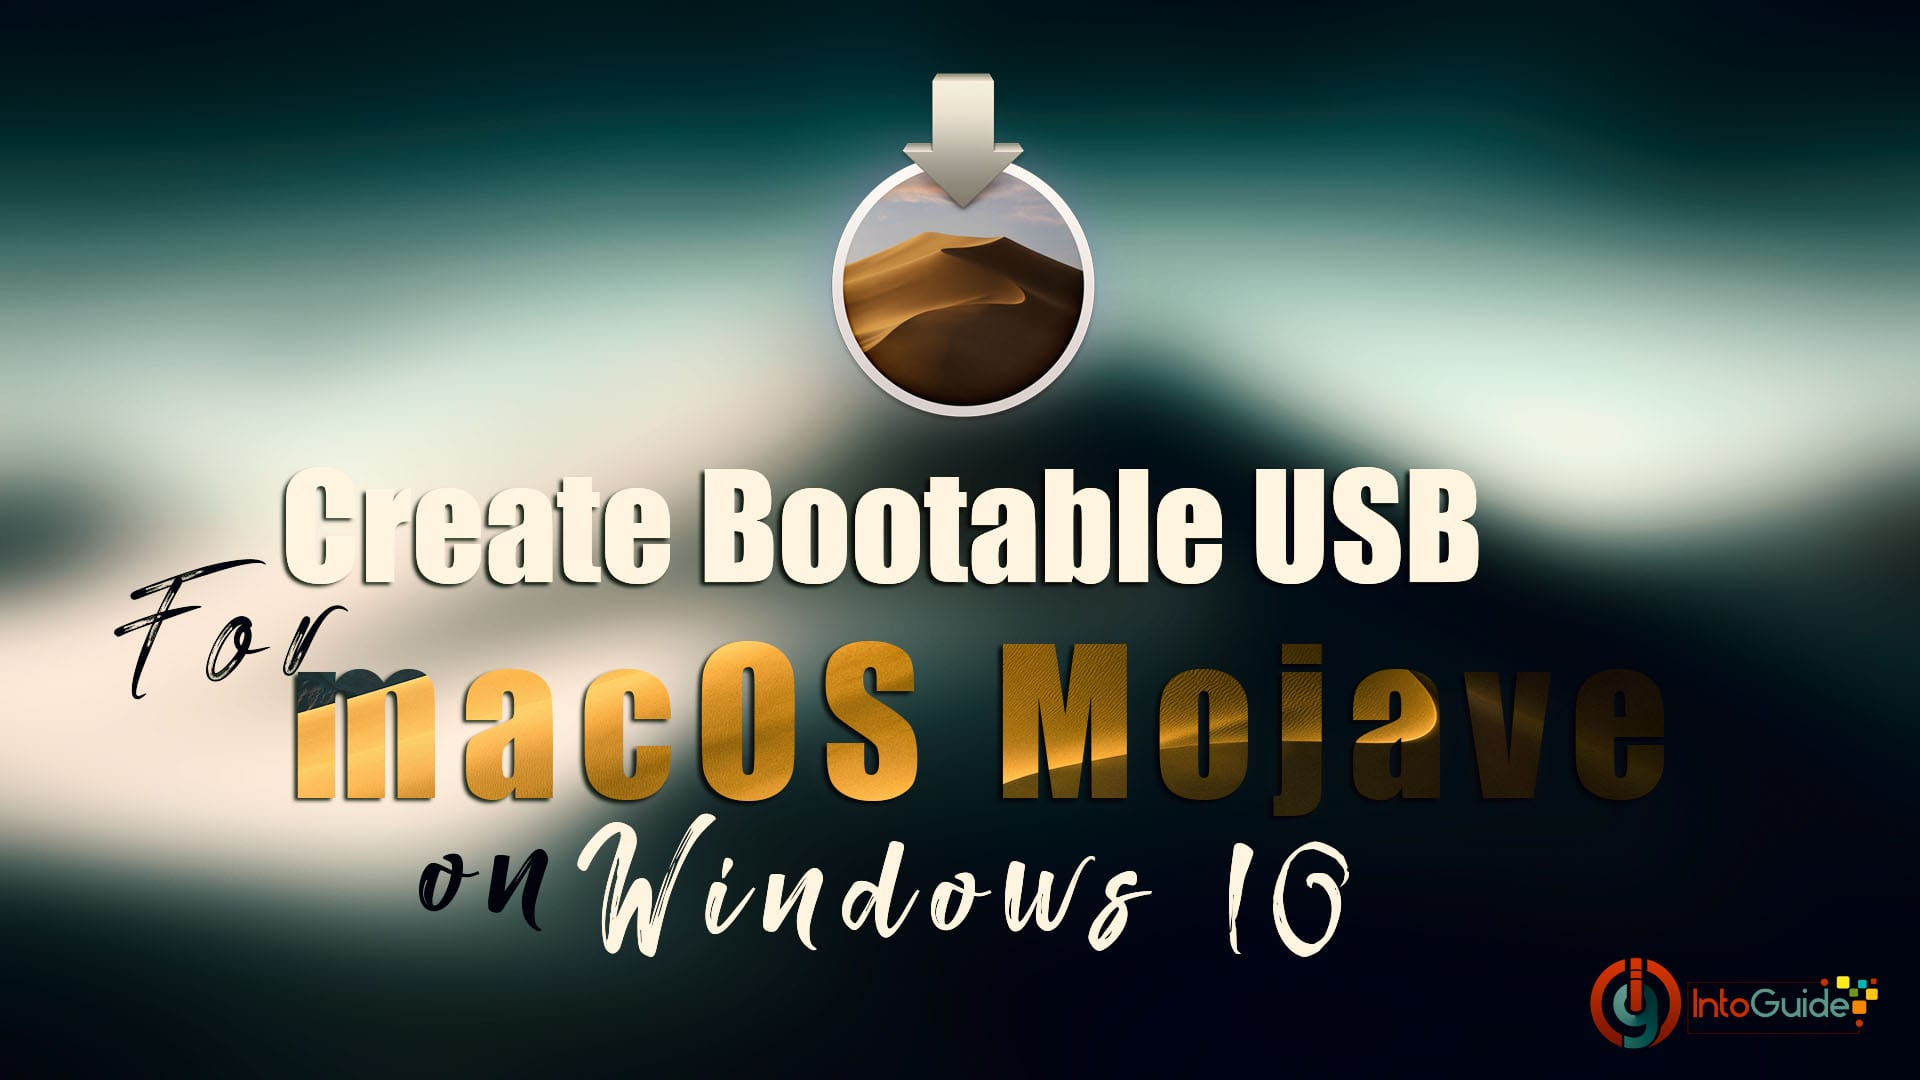 How to create mac os sierra boot usb in windows